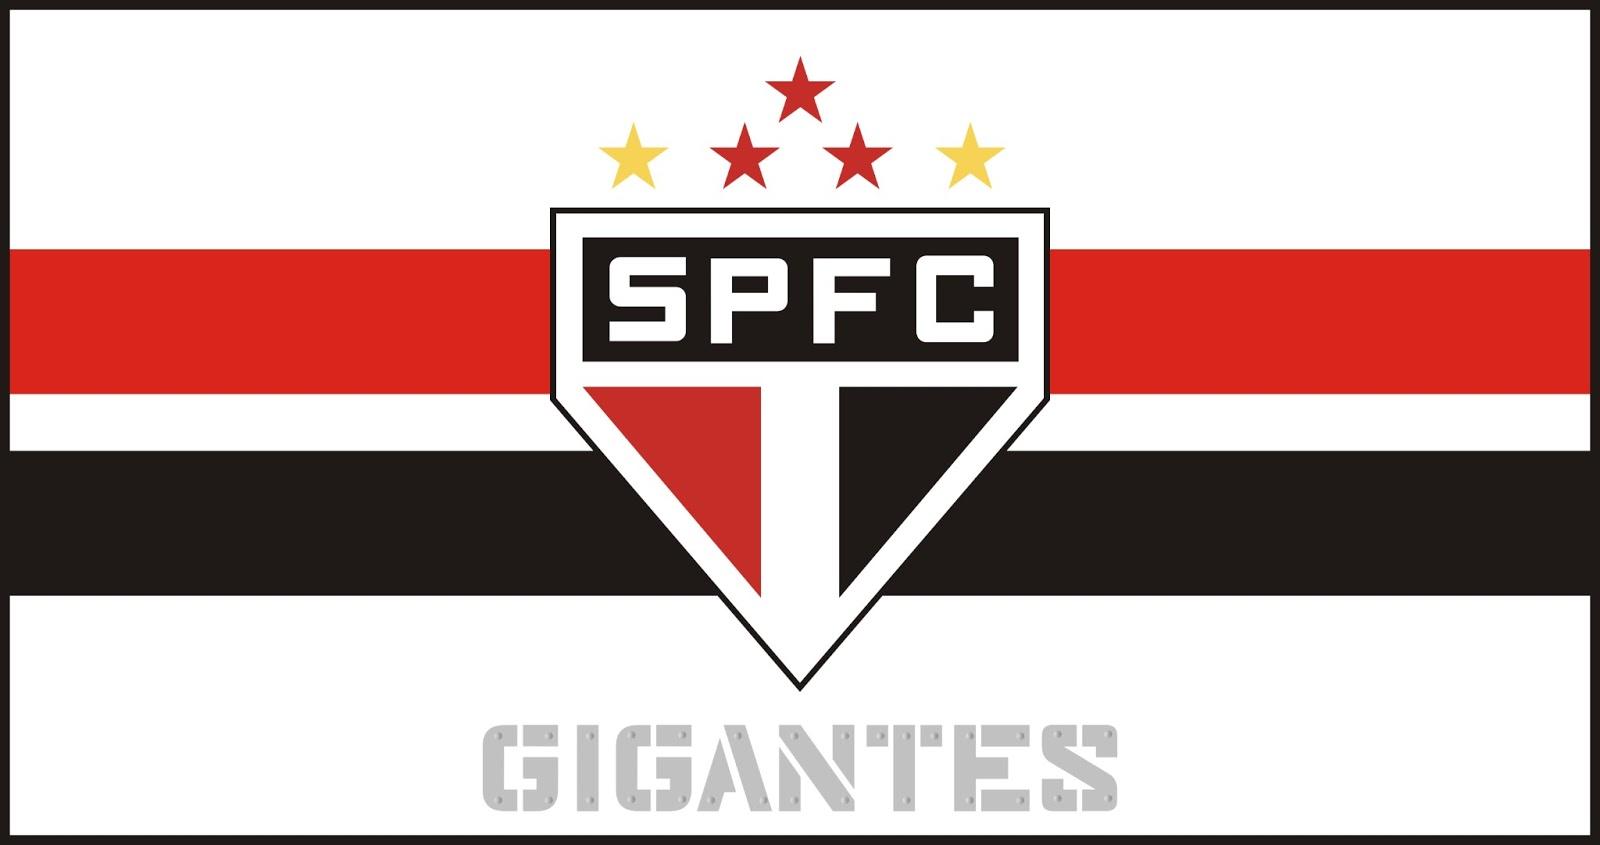 http://3.bp.blogspot.com/-FTPJdewmDJo/USEtY_I-L9I/AAAAAAAACxk/e9gM0iByFEM/s1600/Gigantes%20SPFC.png